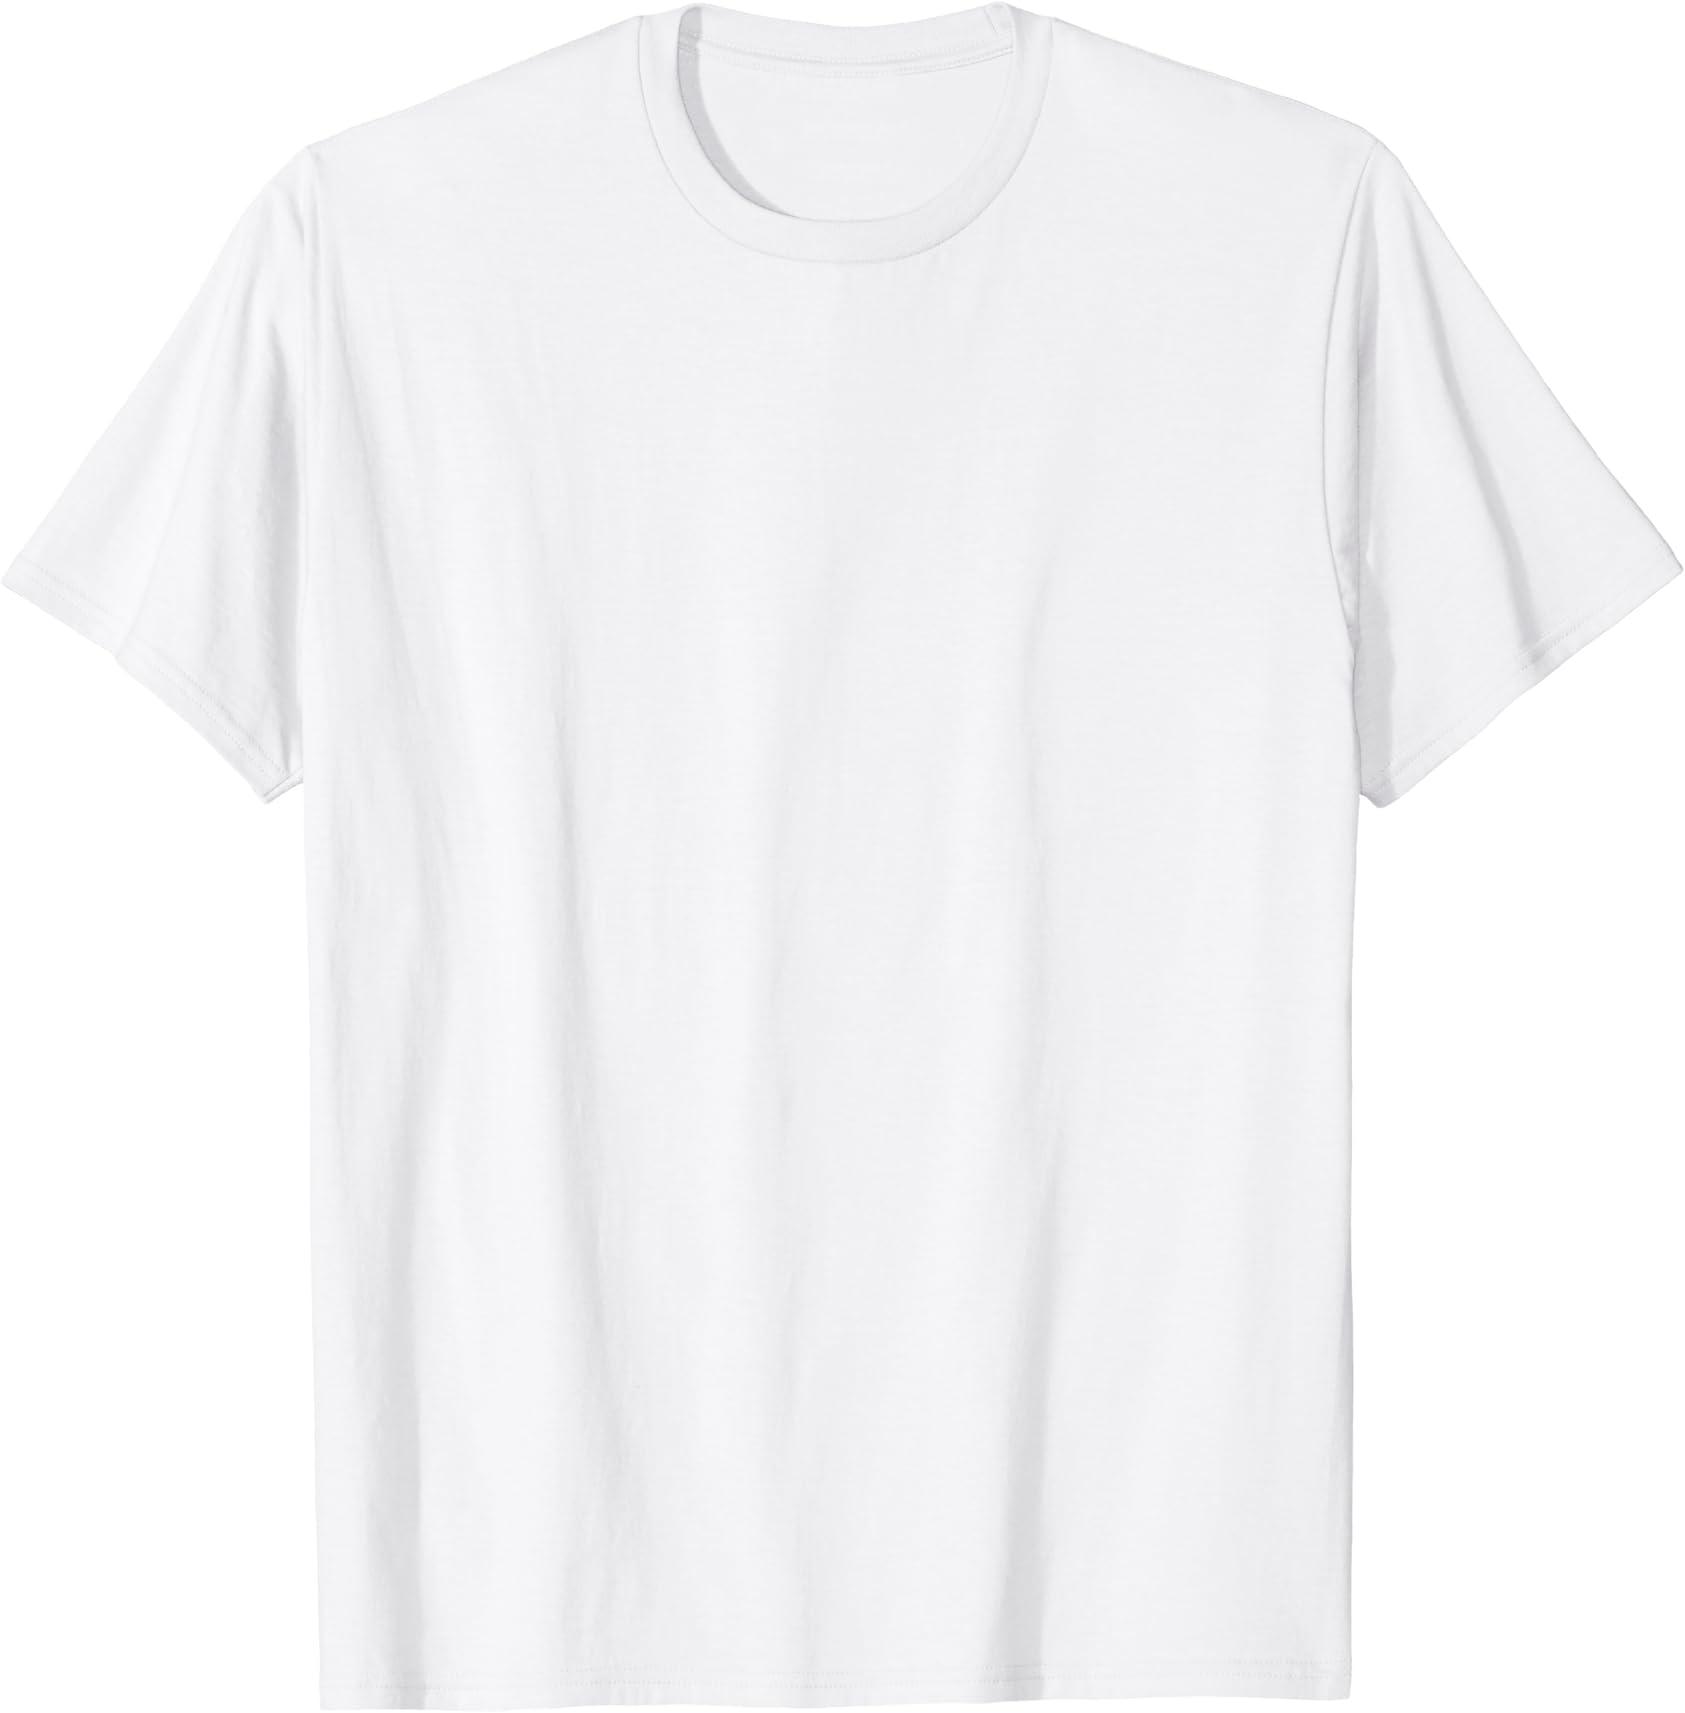 Dexter/'s Laboratory Cartoon Network Cast Vintage Style Big Boys T-Shirt Tee